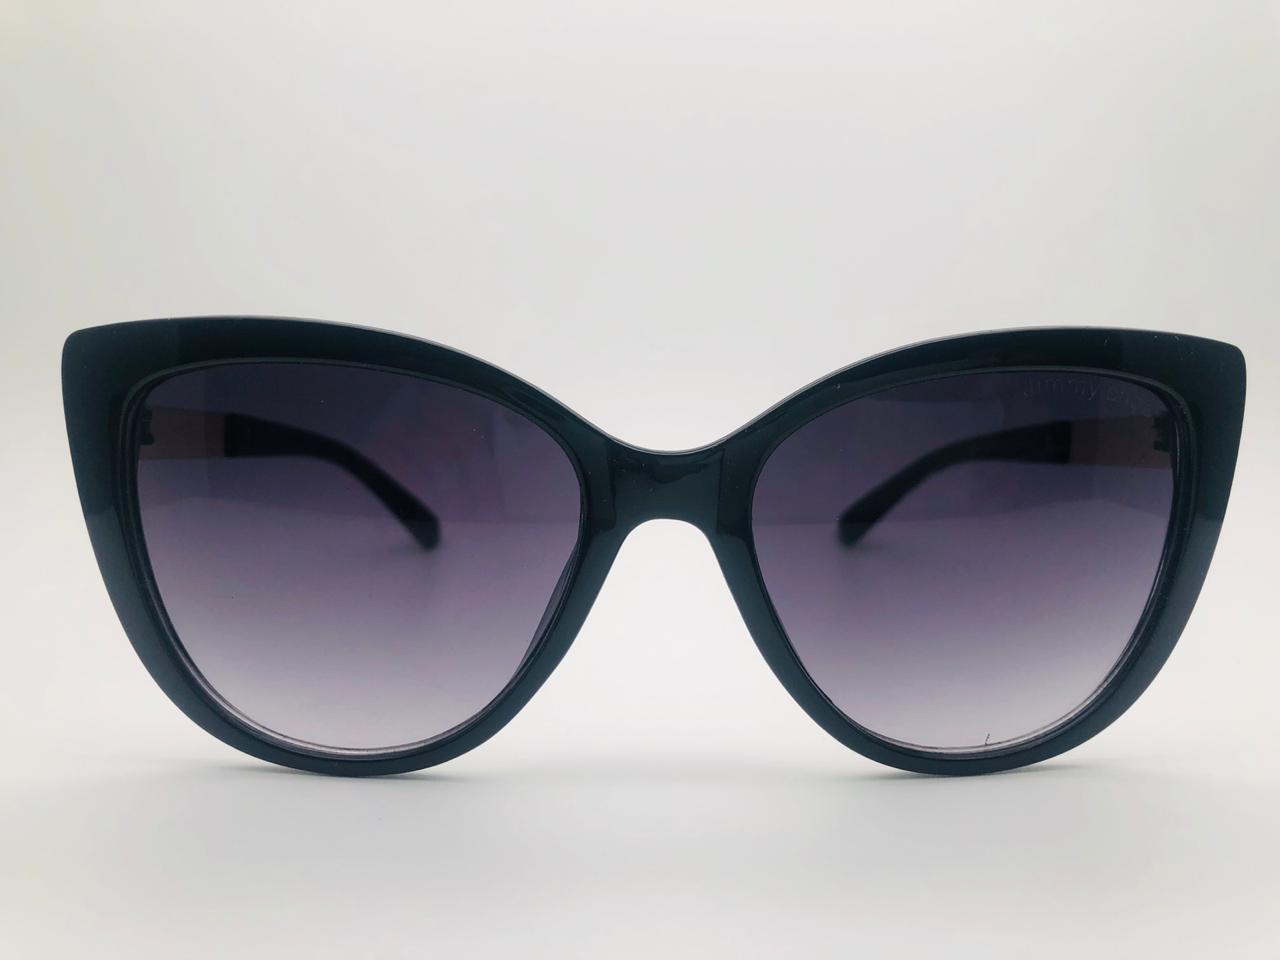 3966fd72f487 Buy Jimmy Choo Eyewear Glasses at Best Prices Online in Pakistan ...